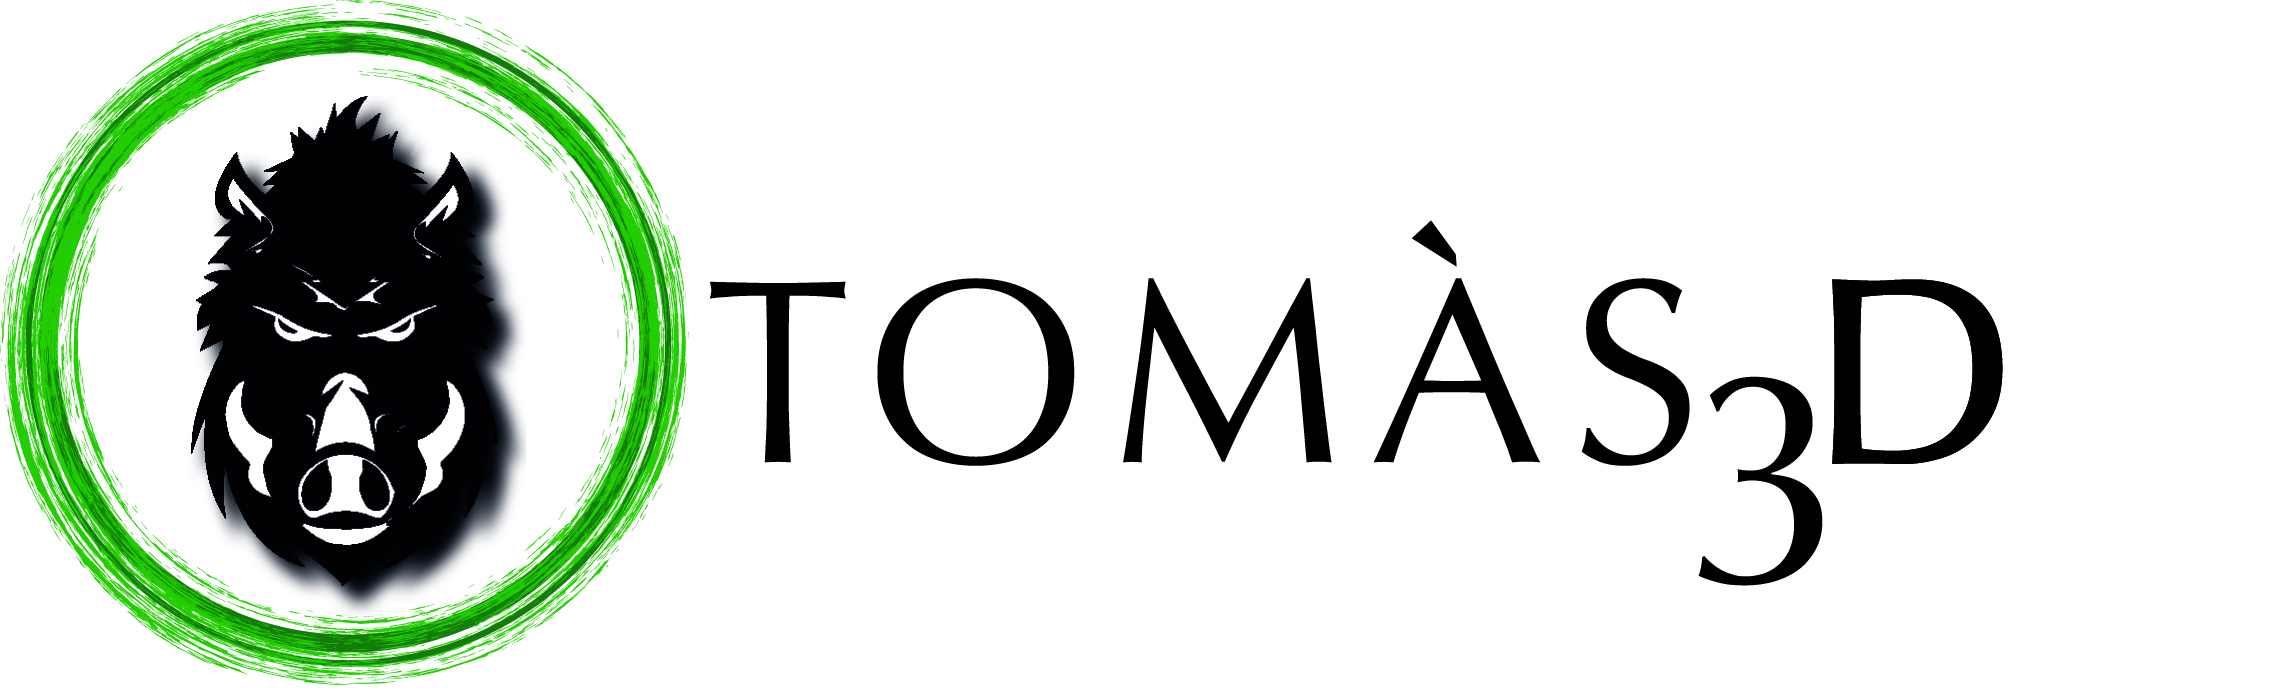 Tomàs3D